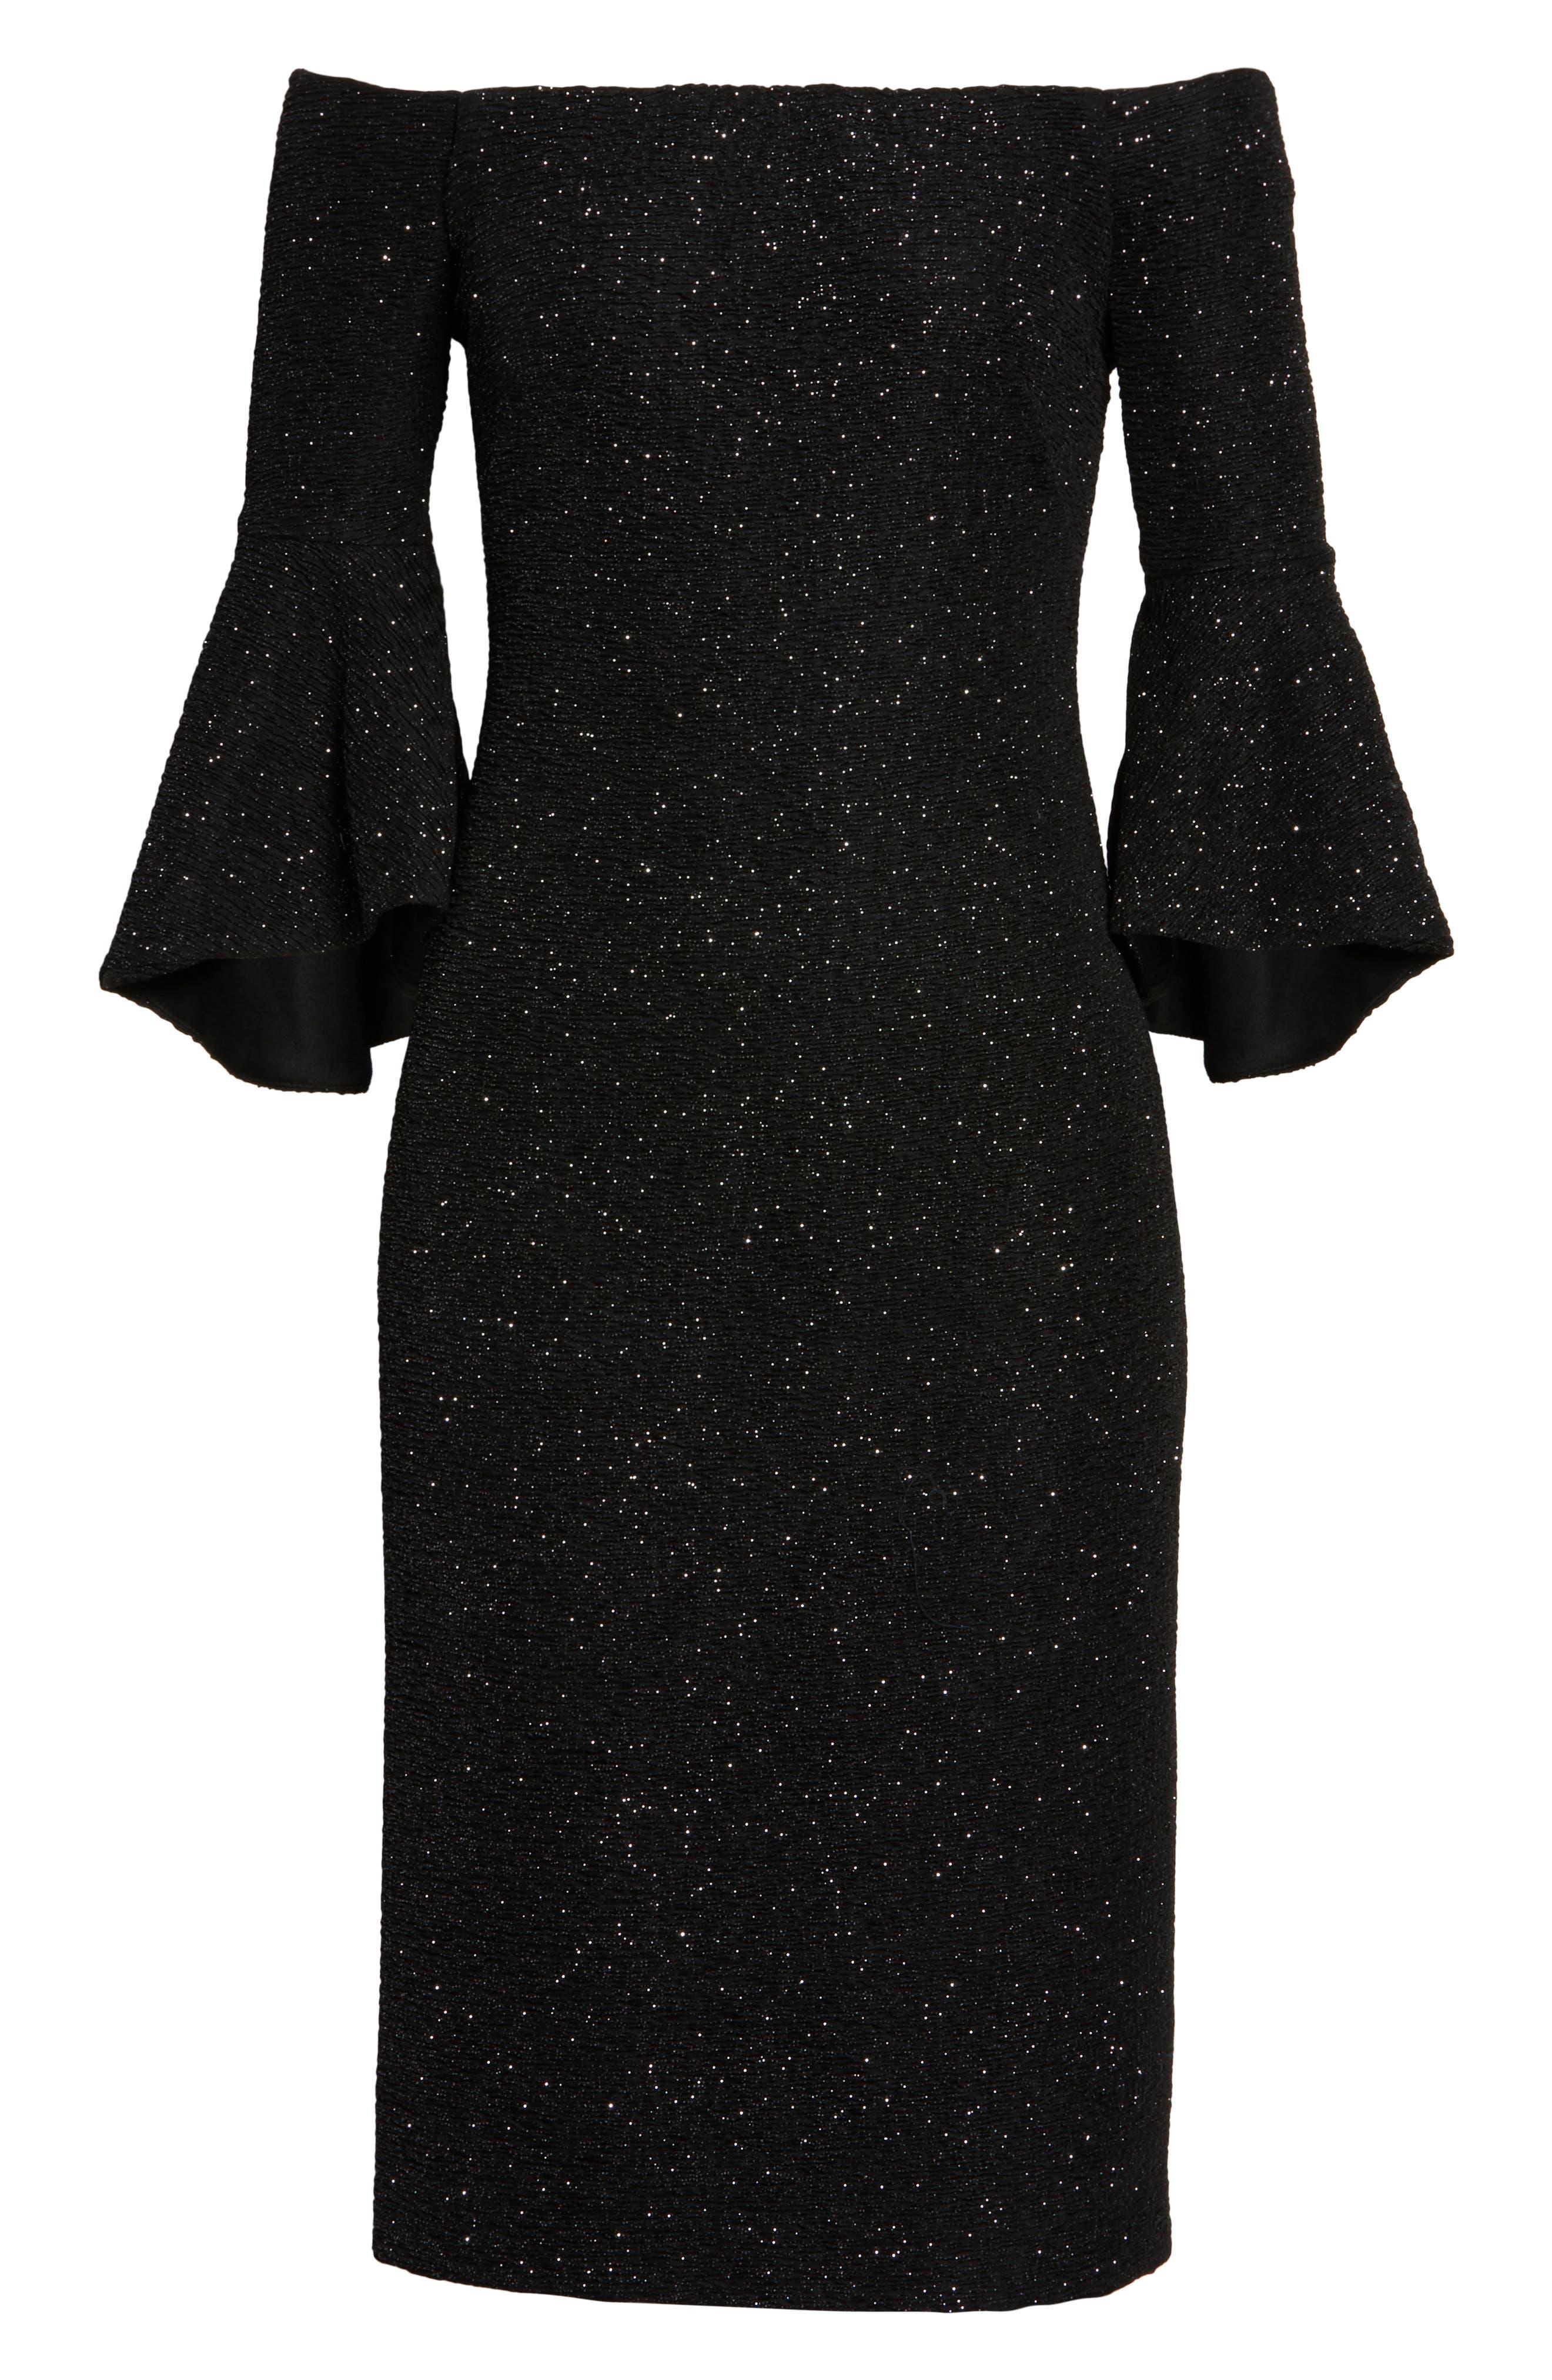 Off the Shoulder Bell Sleeve Sheath Dress,                             Alternate thumbnail 6, color,                             046